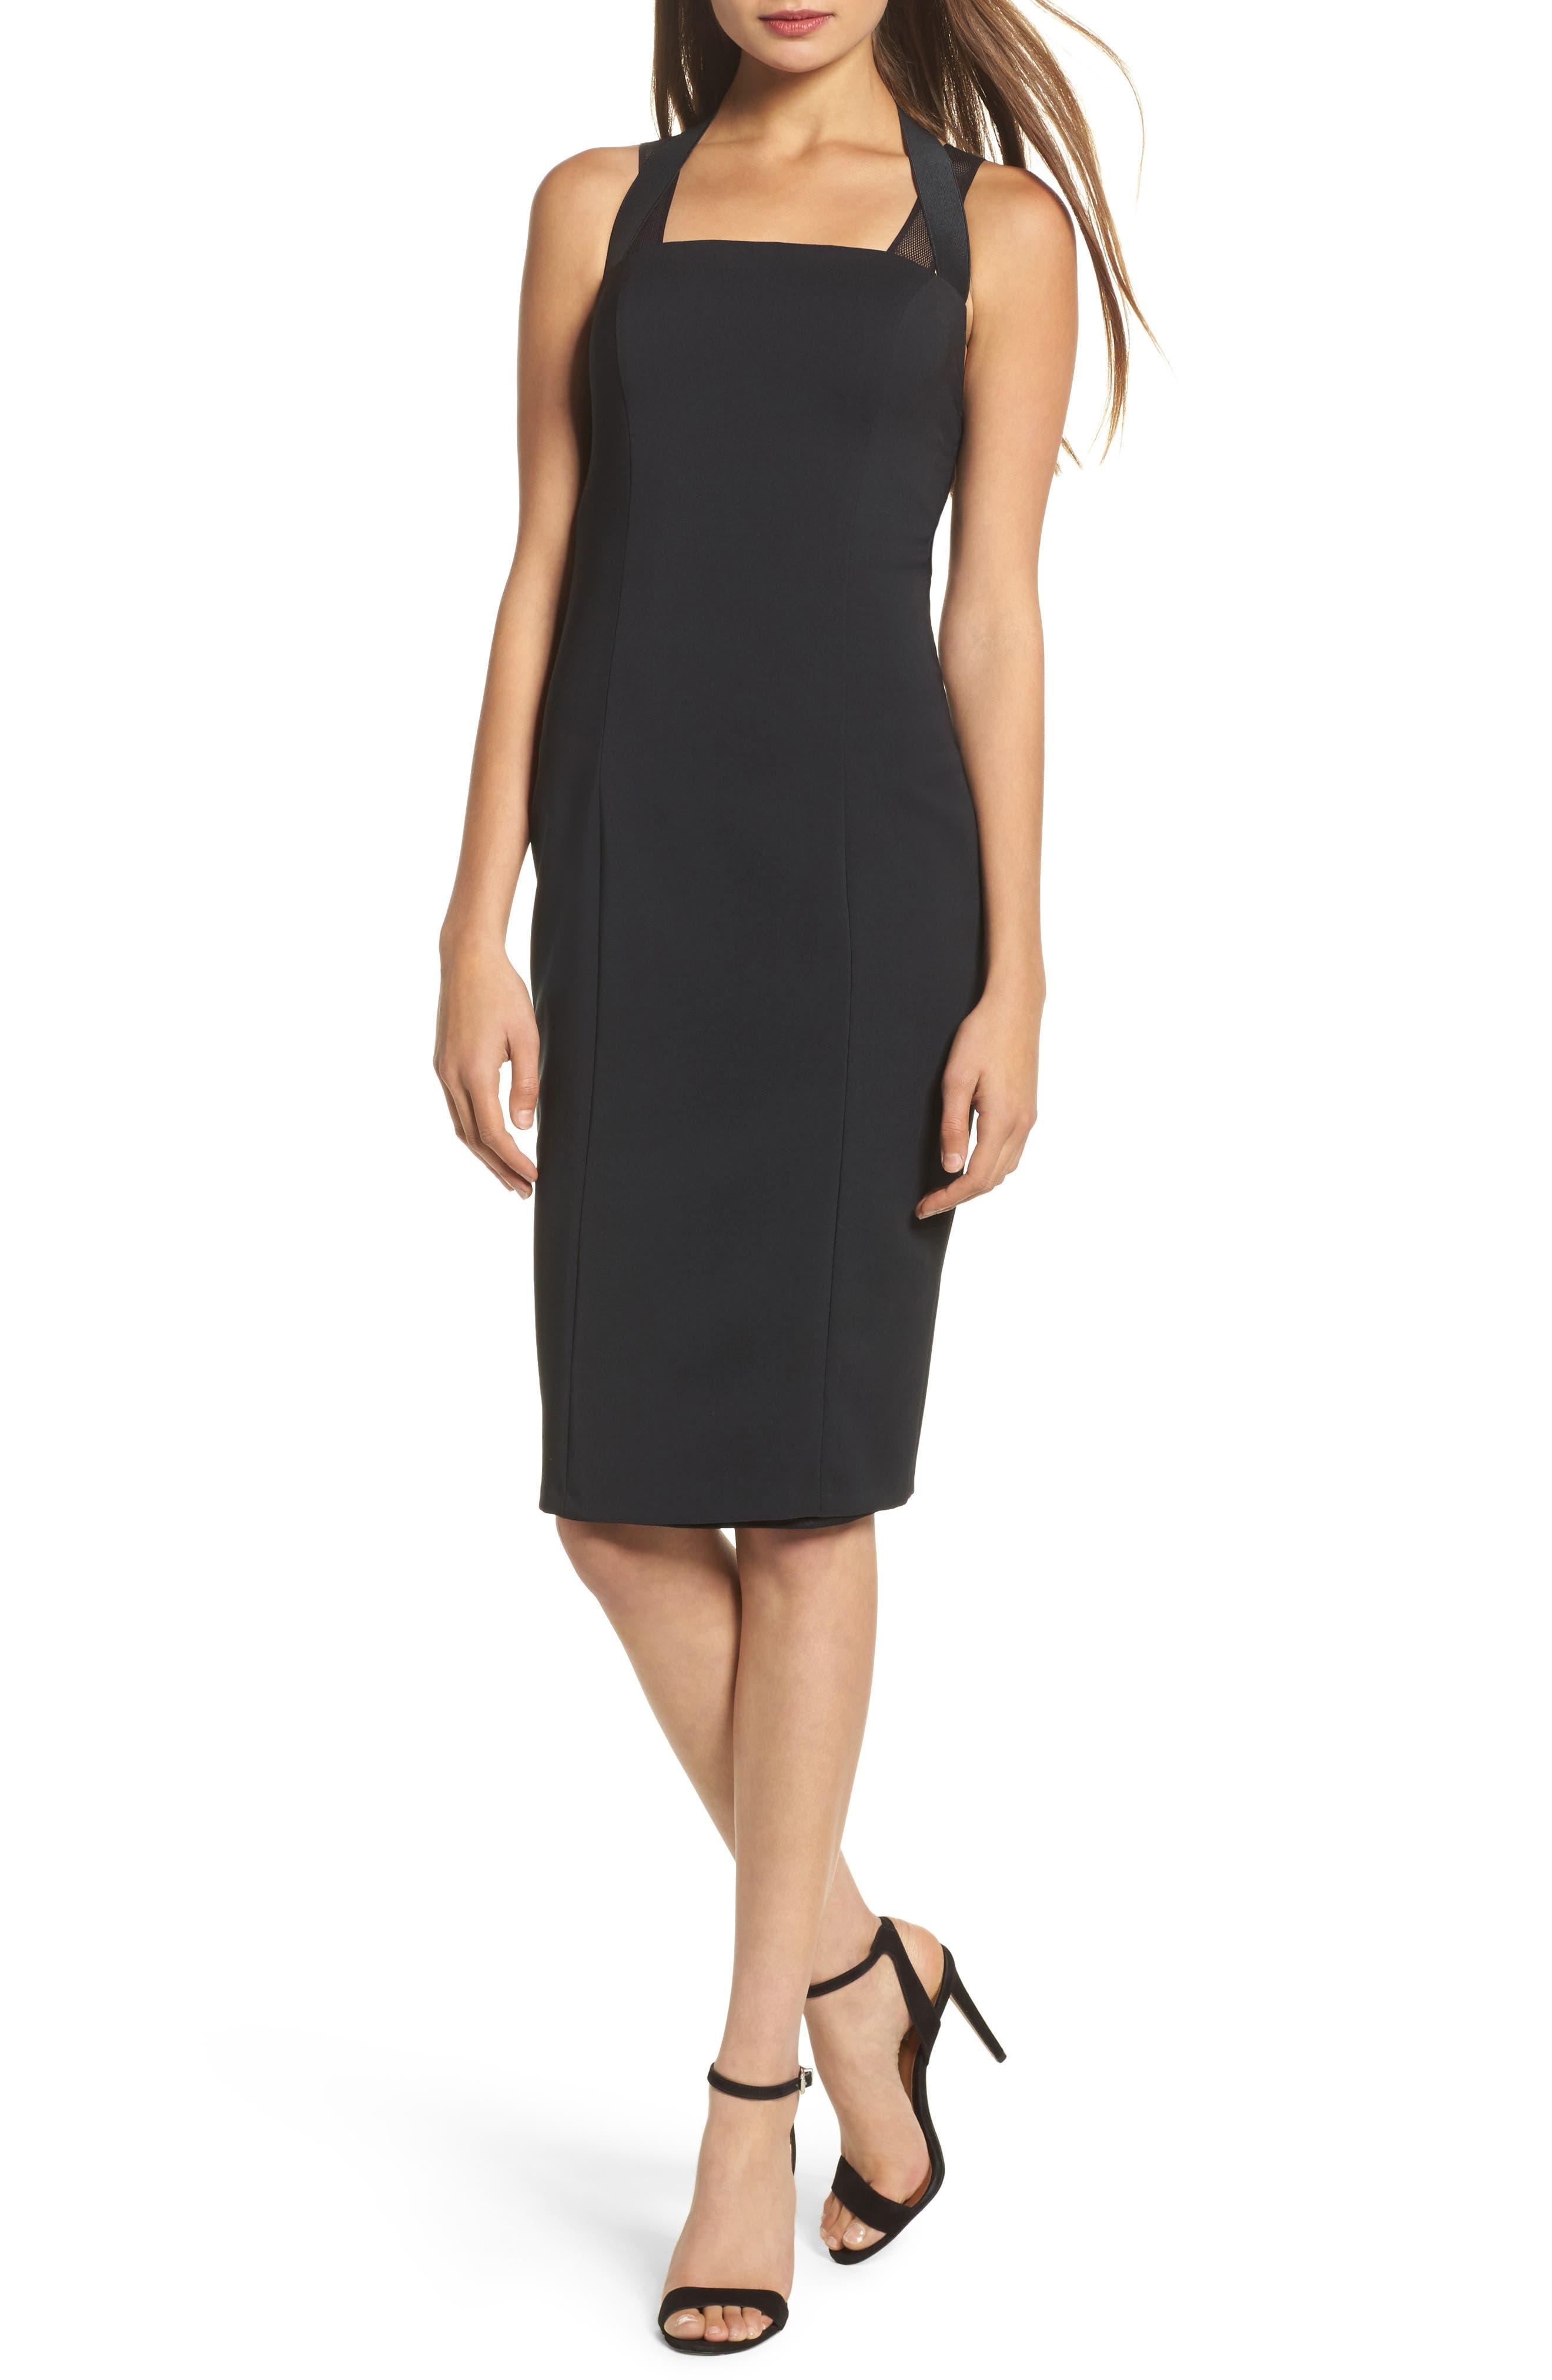 Kendra Elastic Strap Low Back Sheath Dress,                             Main thumbnail 1, color,